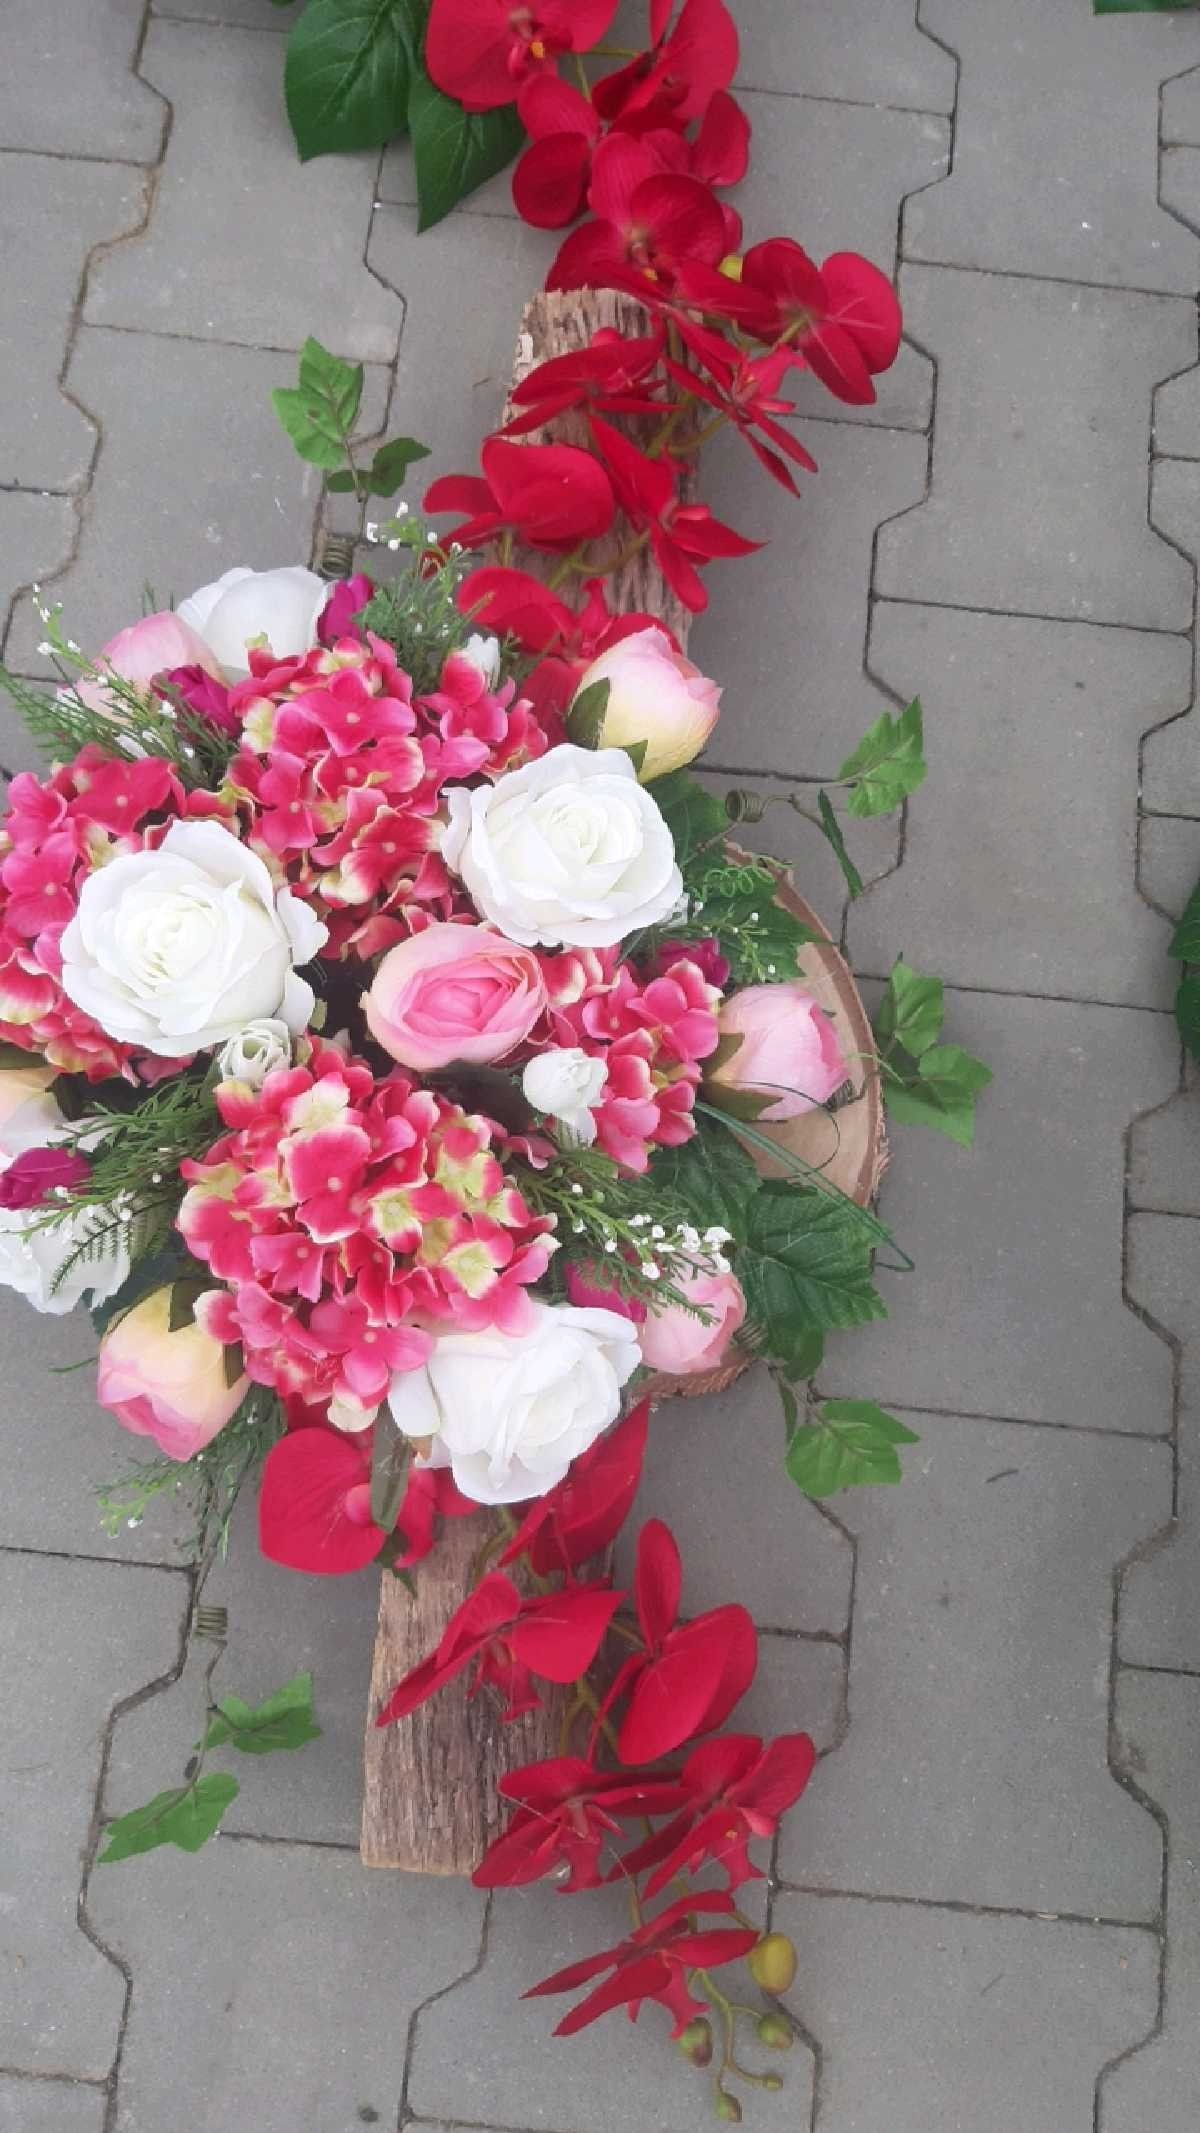 Pin By Emilia Sedziak On Wience Wreaths Floral Wreath Floral